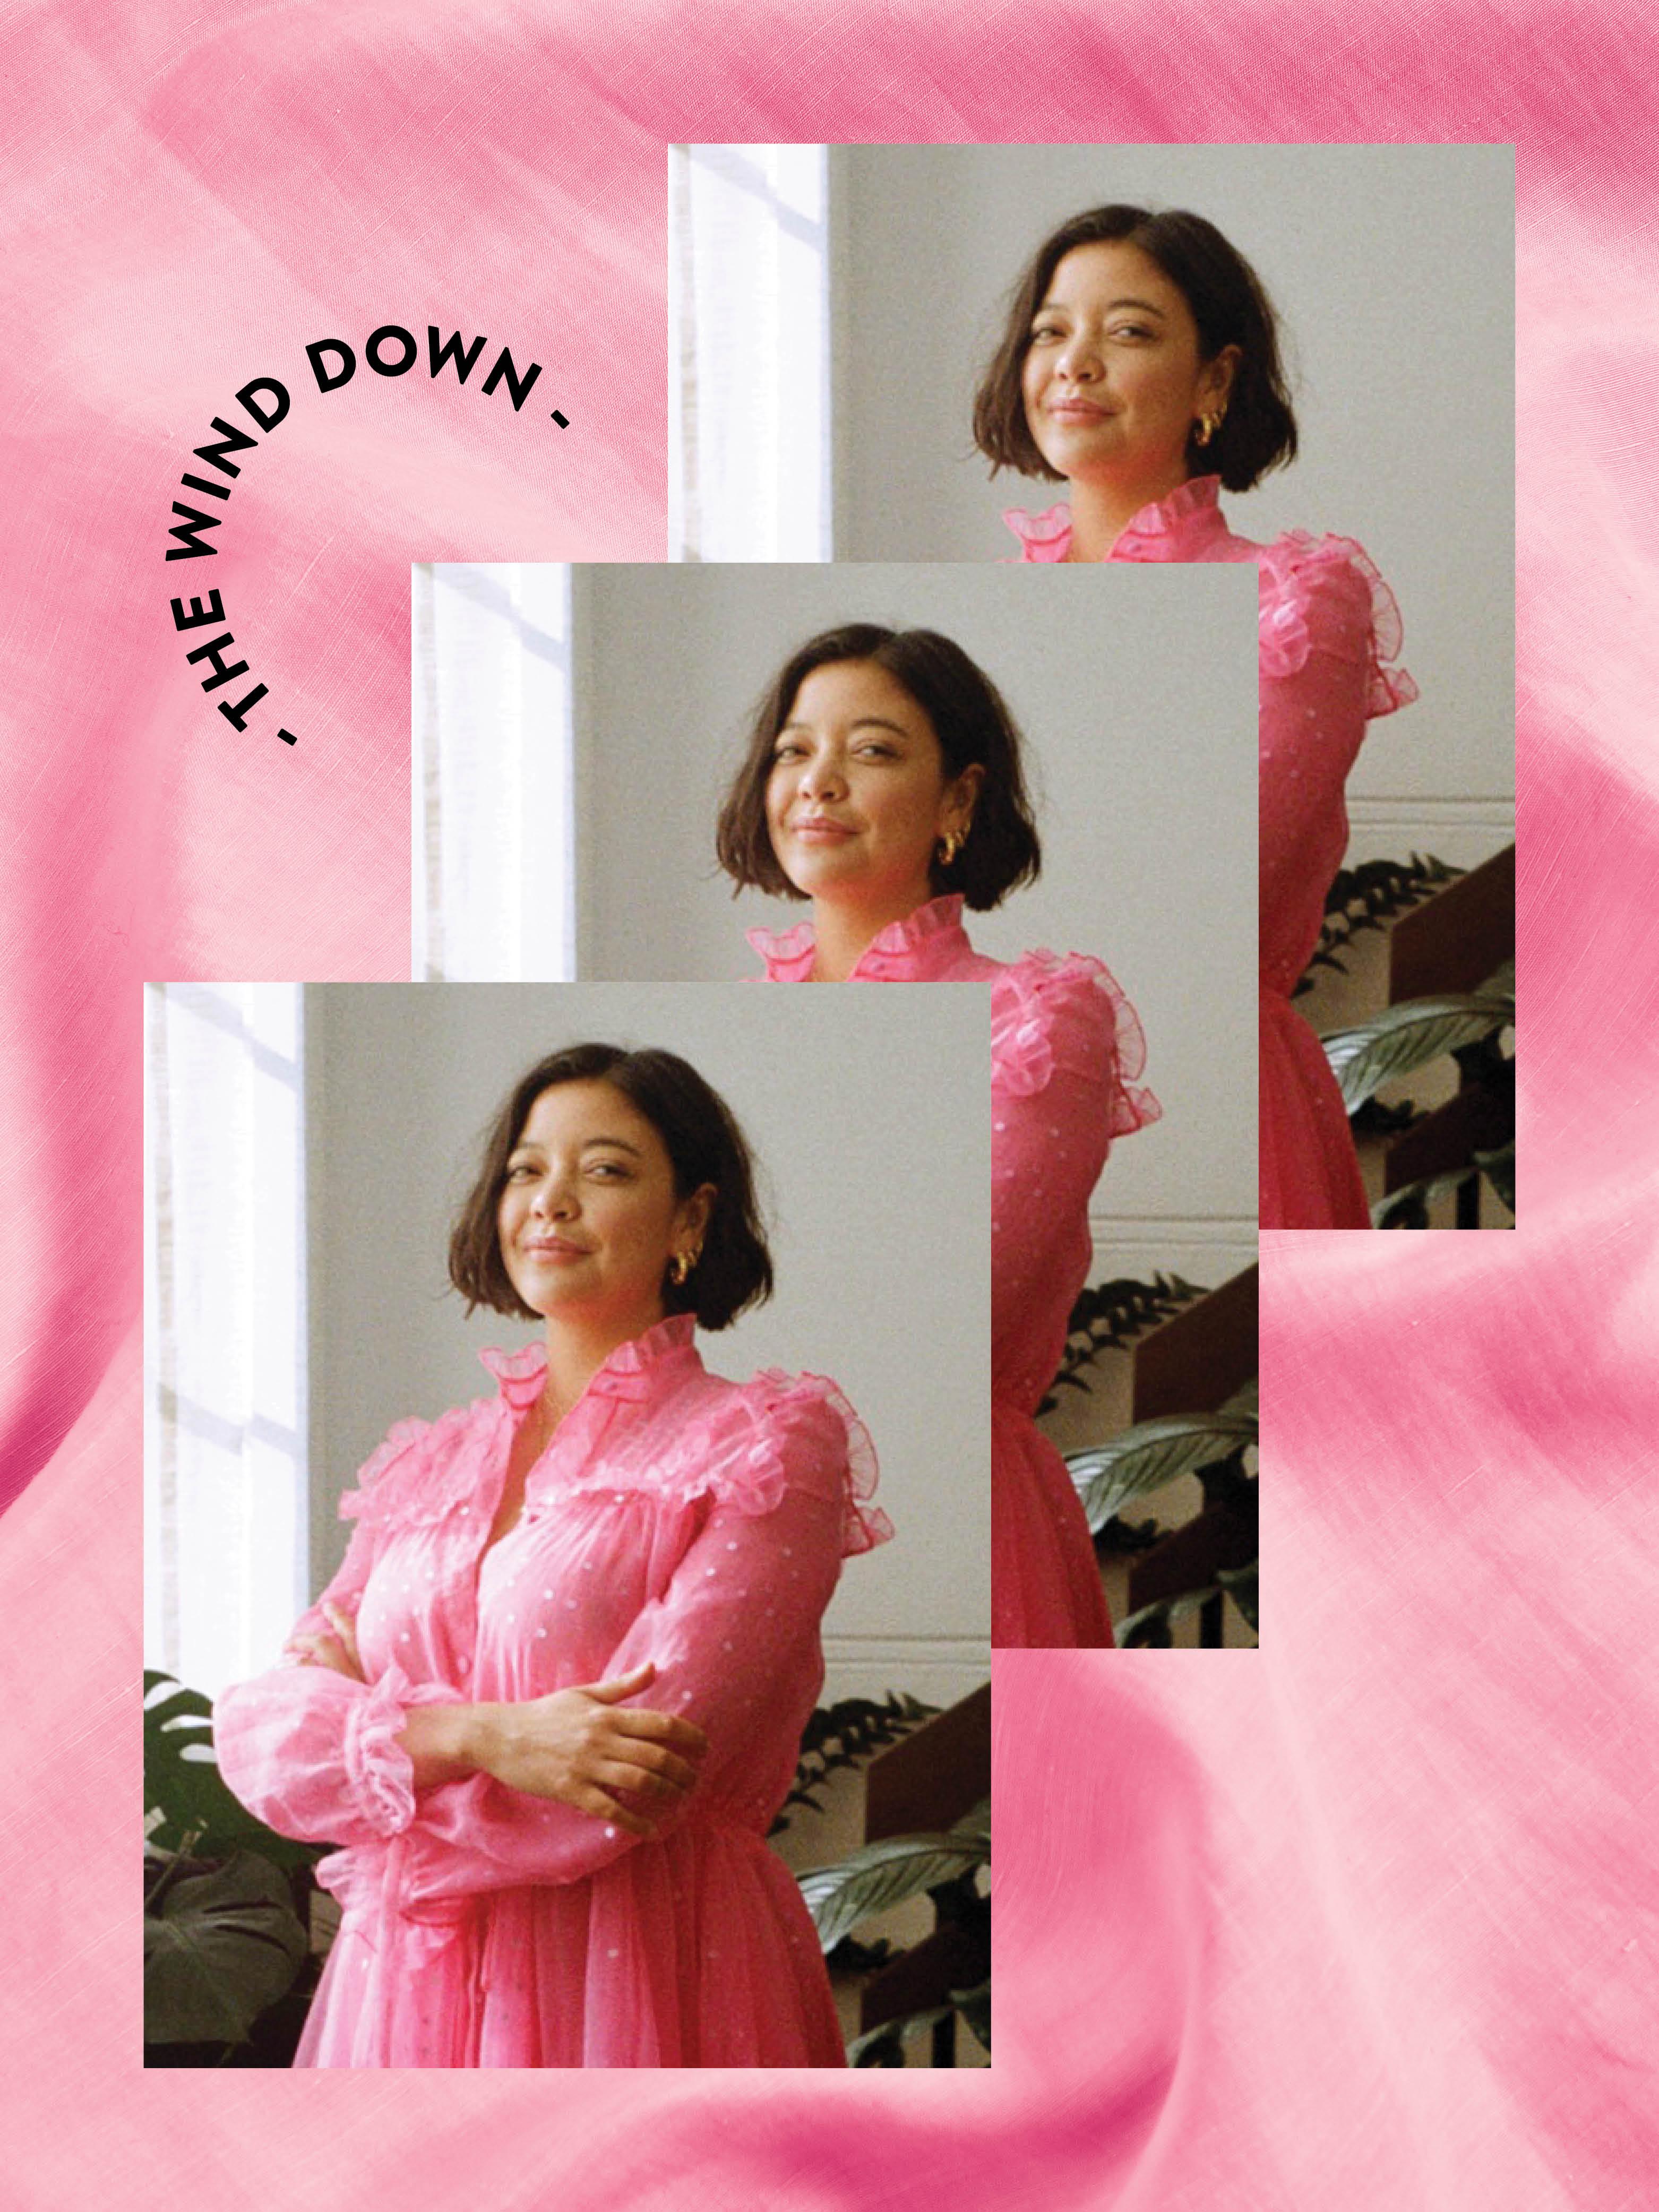 naomi-shimada-wind-down-domino